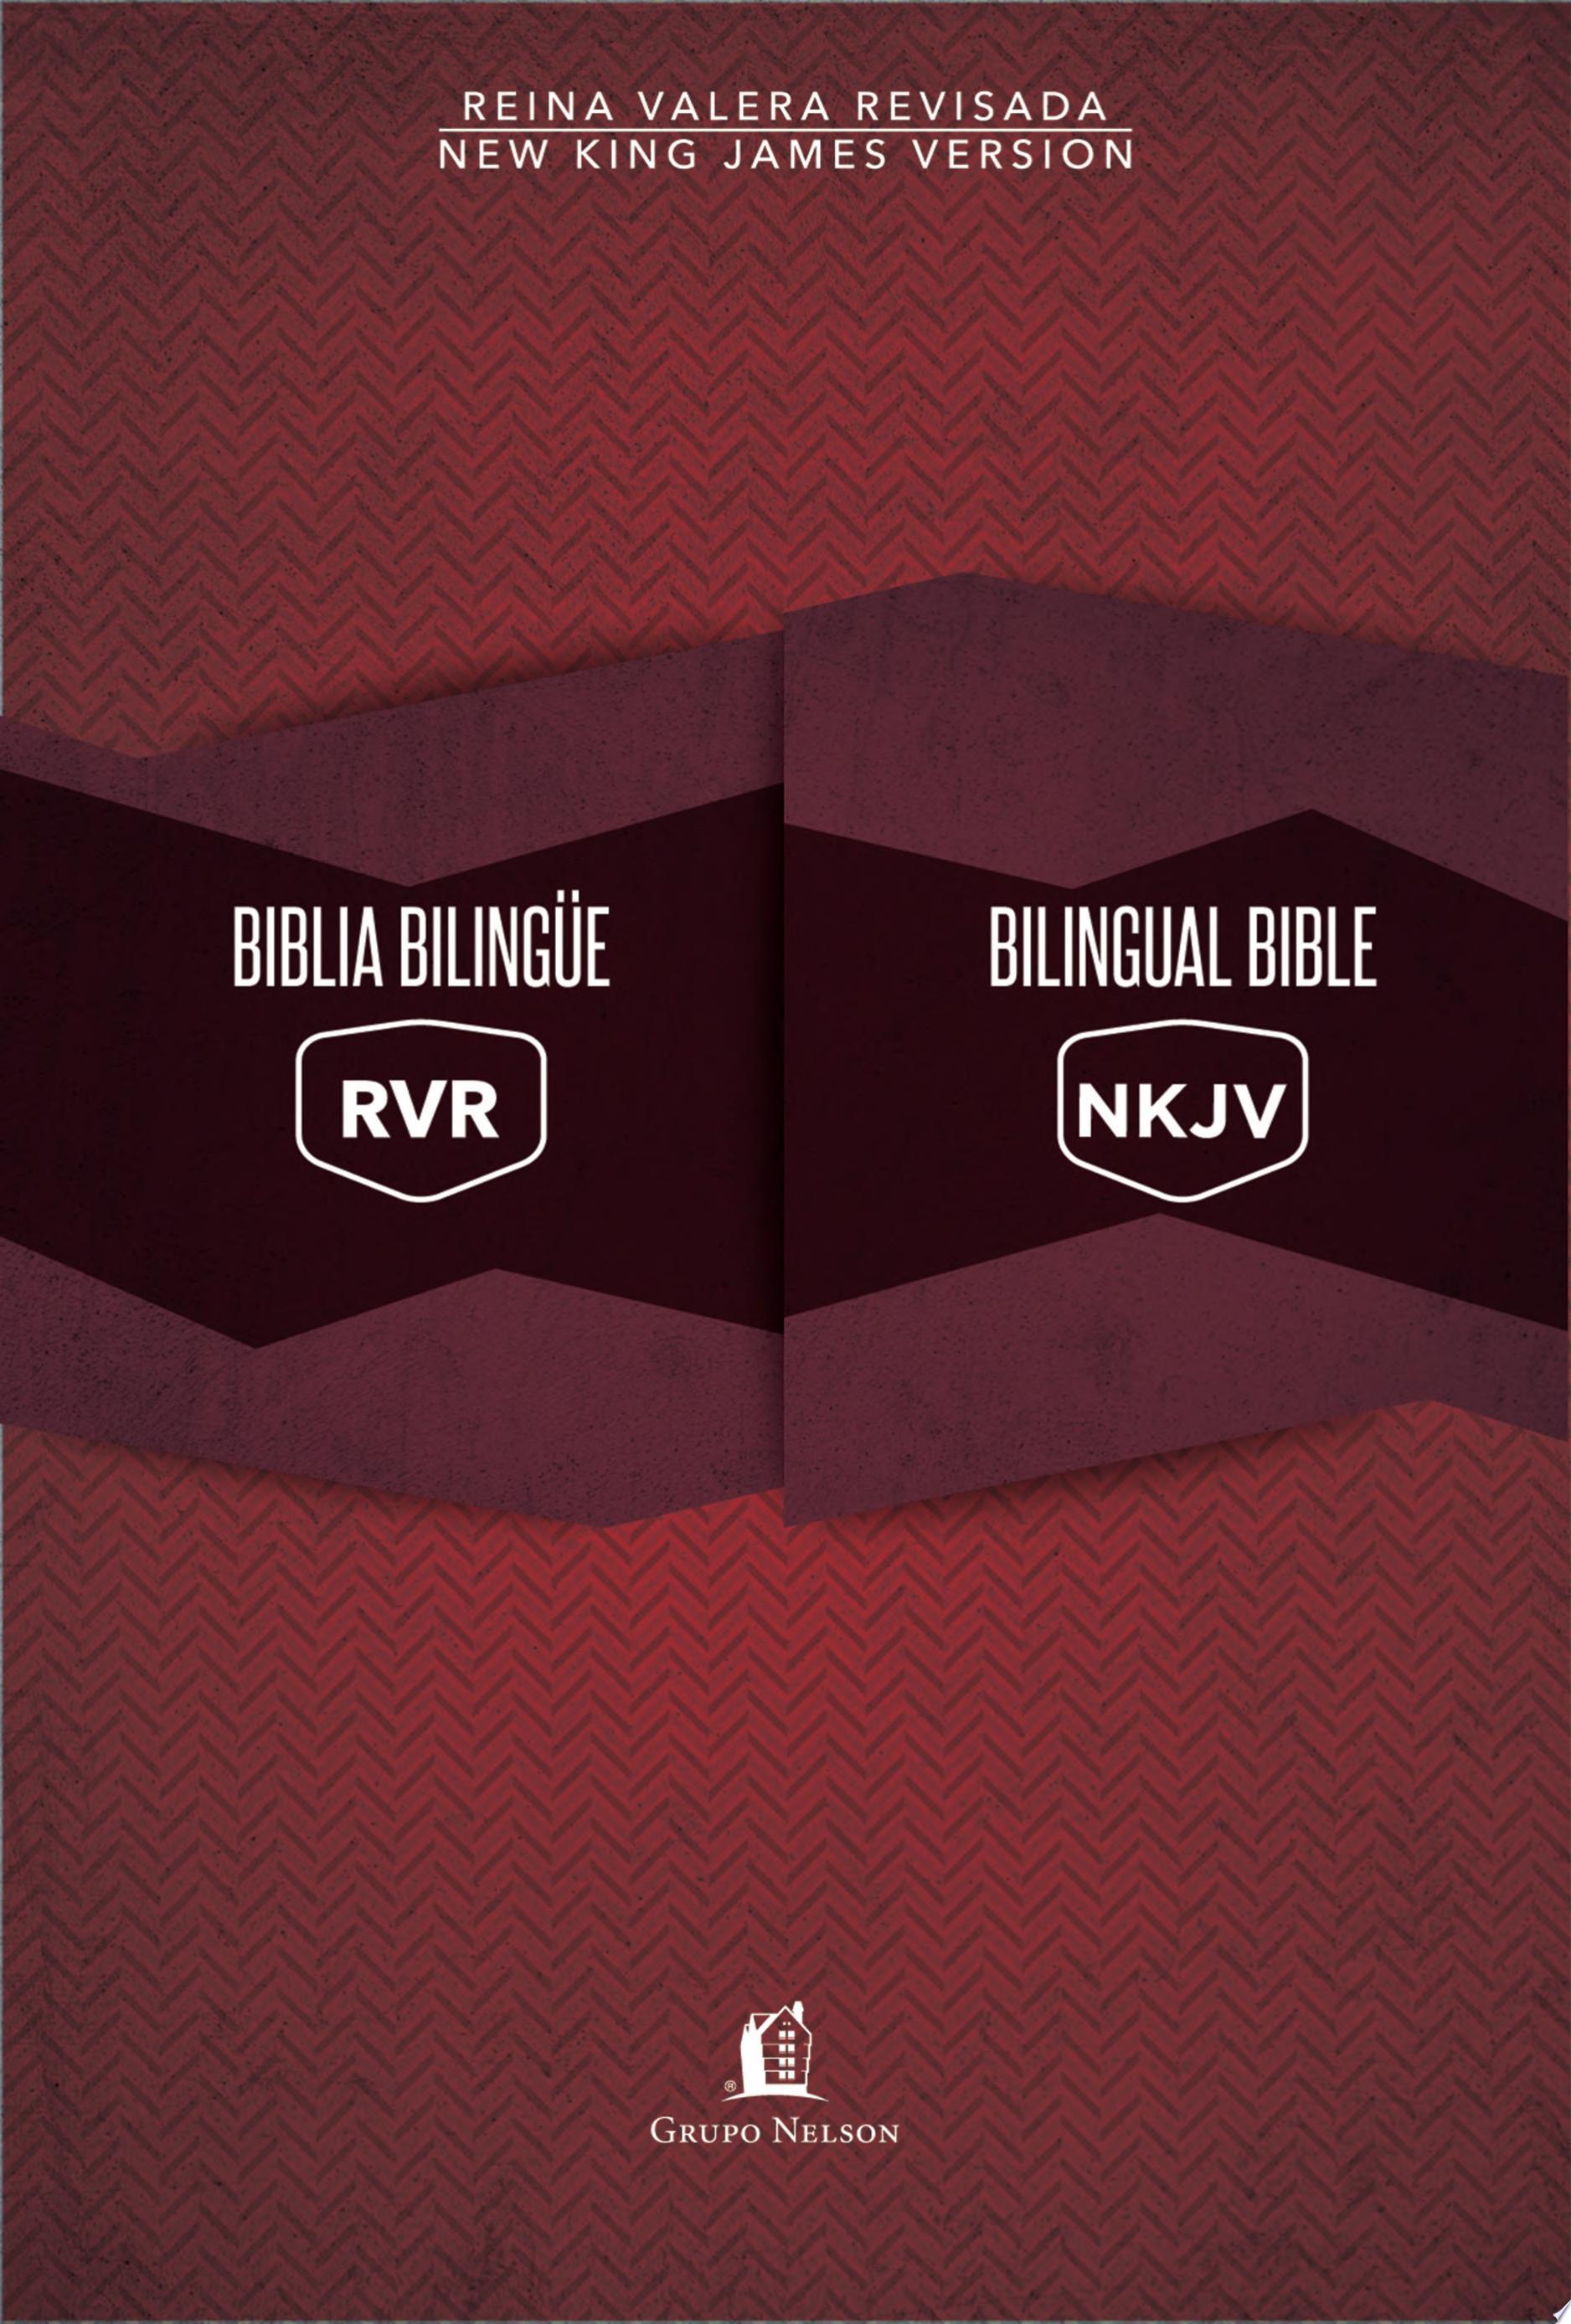 Biblia biling  e Reina Valera Revisada   New King James